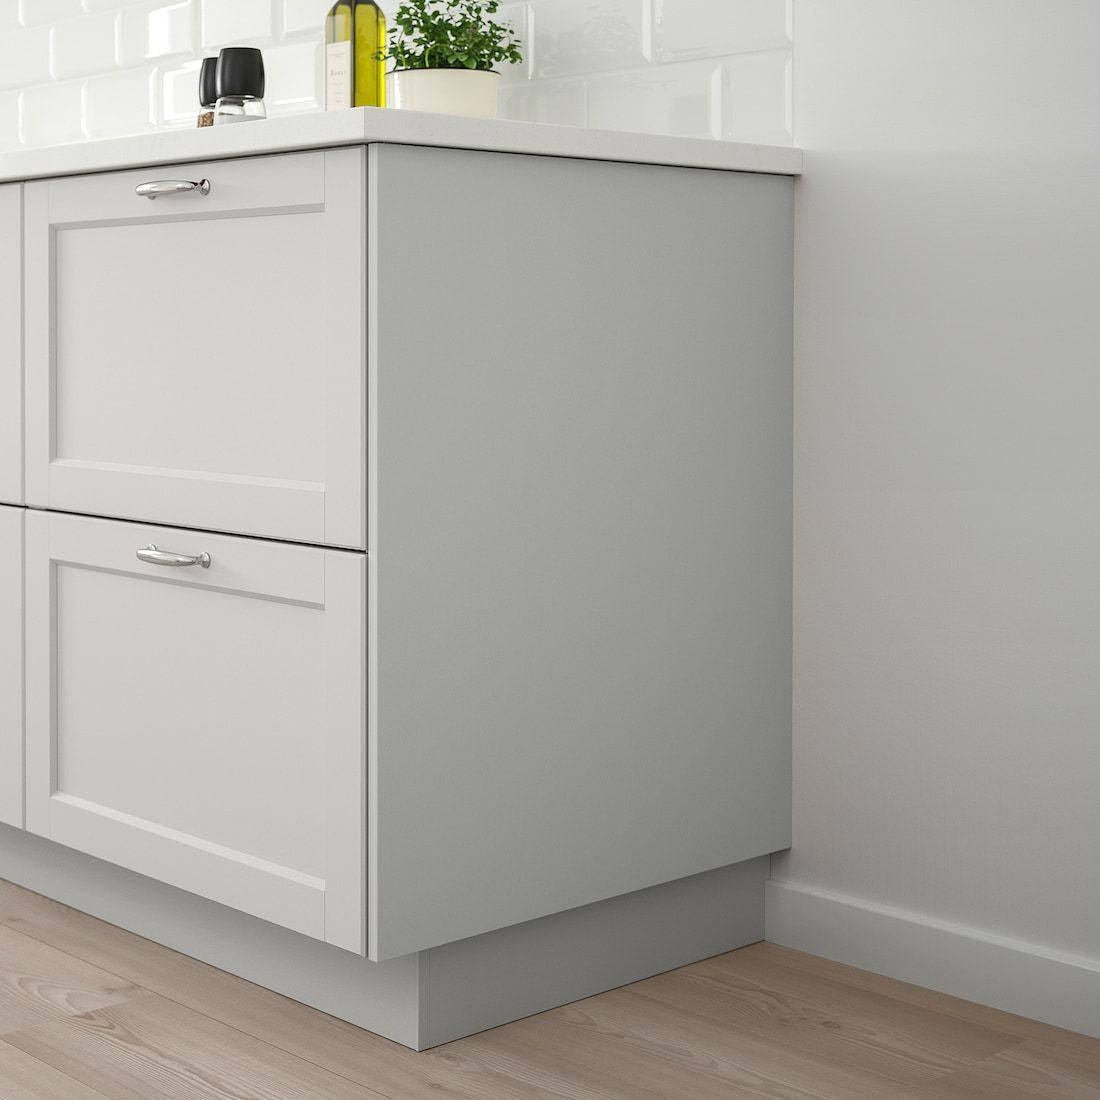 Lerhyttan Cover Panel Light Gray 25x30 Ikea In 2020 Grey Ikea Kitchen Light Gray Cabinets Light Grey Kitchens